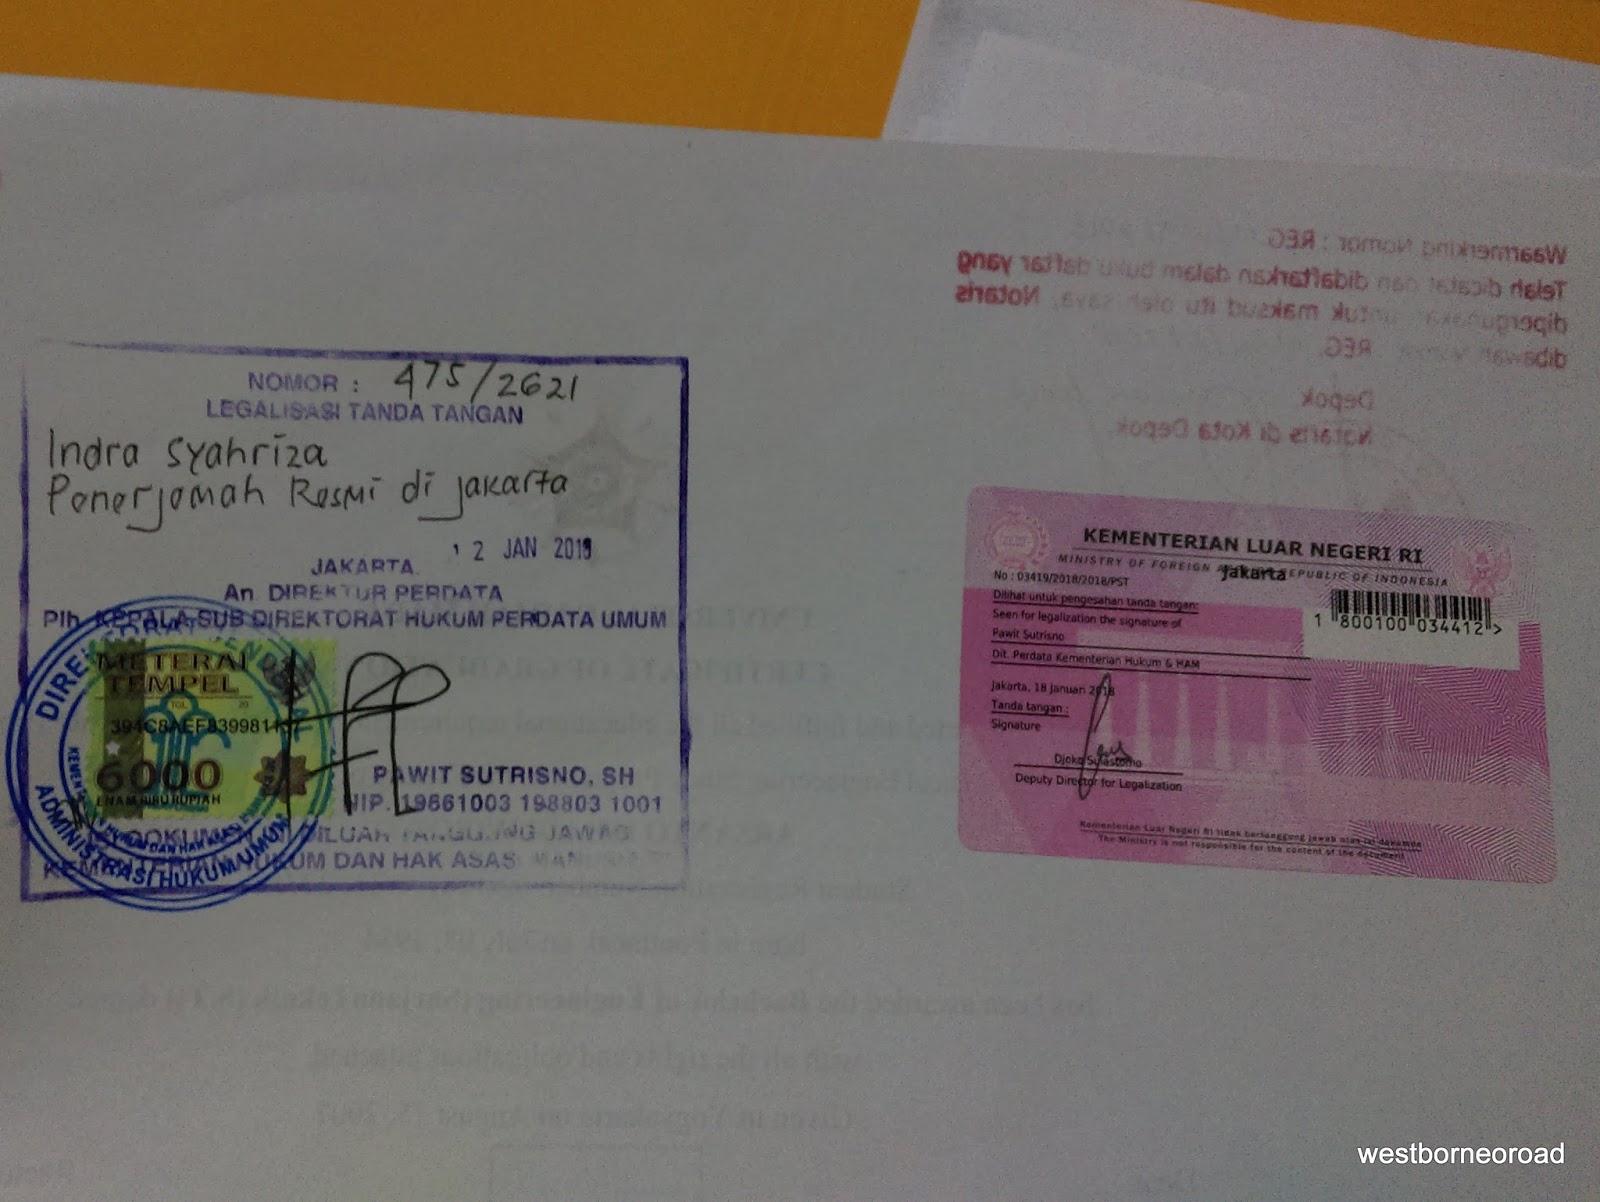 West Borneo Road Pengalaman Mengurus Legalisir Dokumen Untuk Persayaratan Visa Belajar S2 Di Taiwan